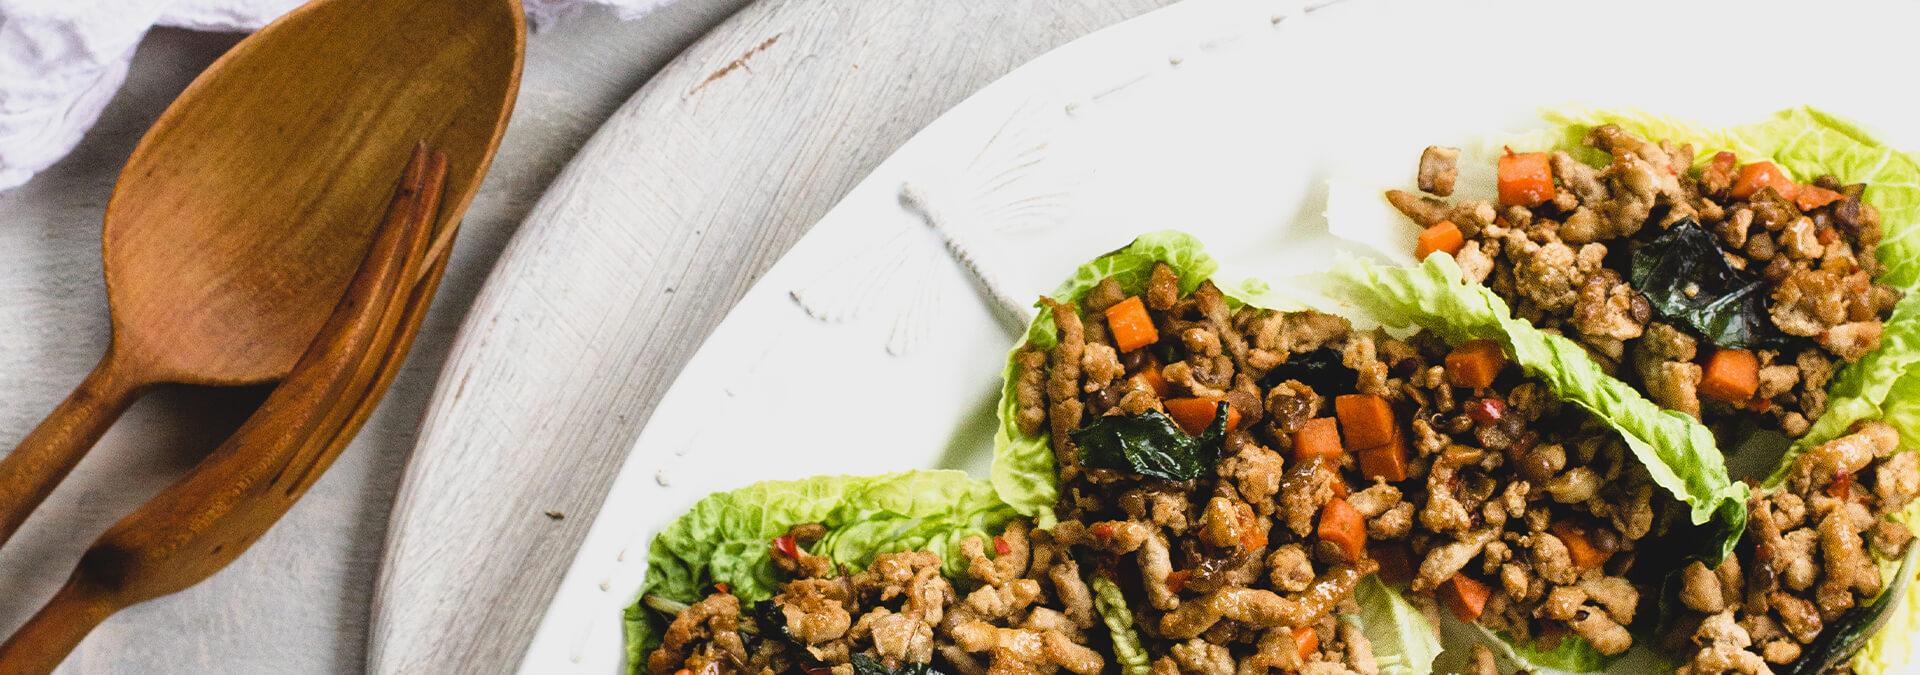 Crab_and_Mung_Bean_Salad_AND_Pork_and_Lentil_San_Choy_Bau_2